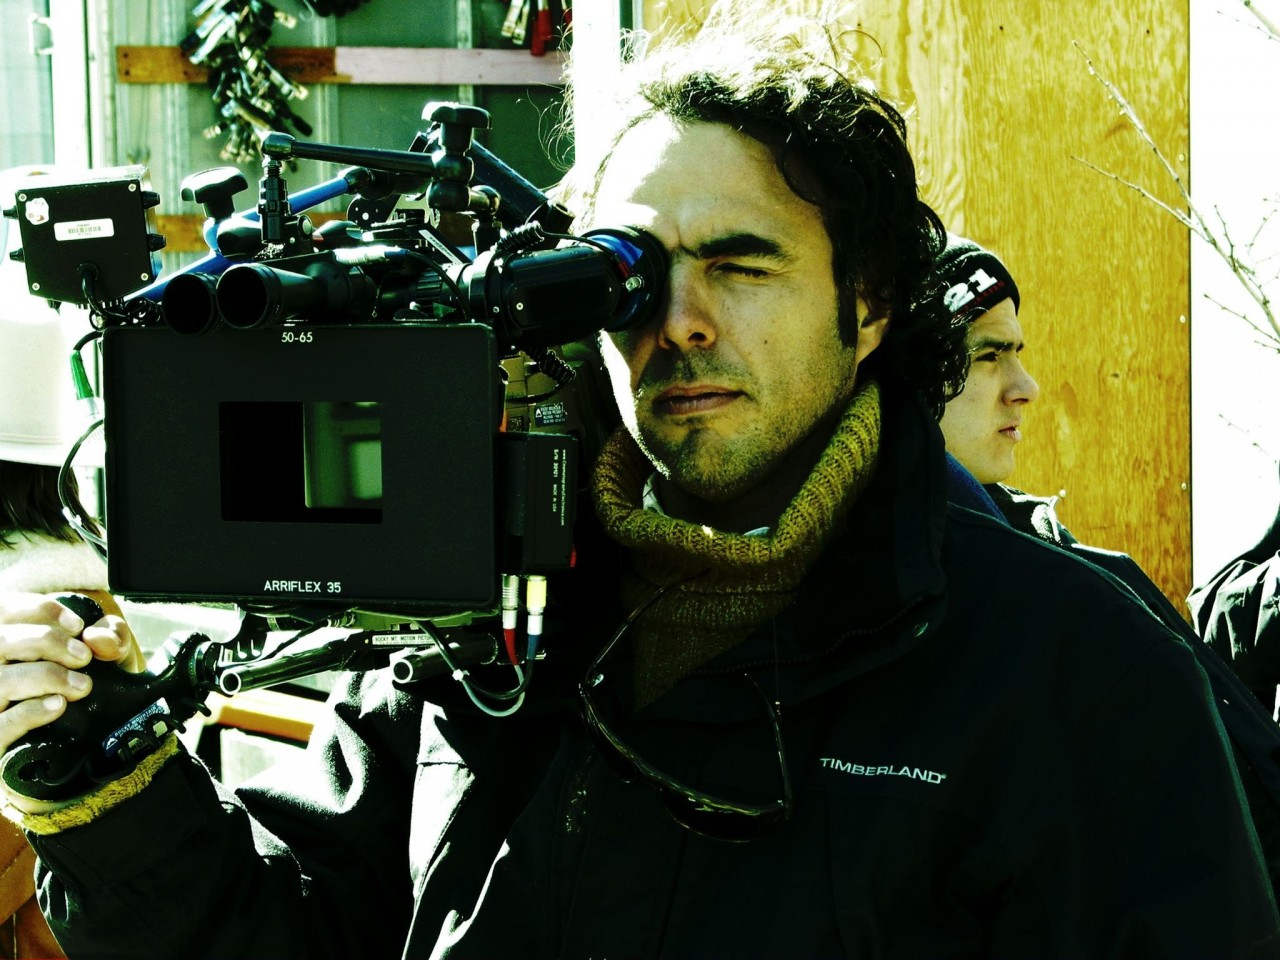 Алехандро Гонсалес Иньярриту на съёмках фильм «21 грамм», 2003